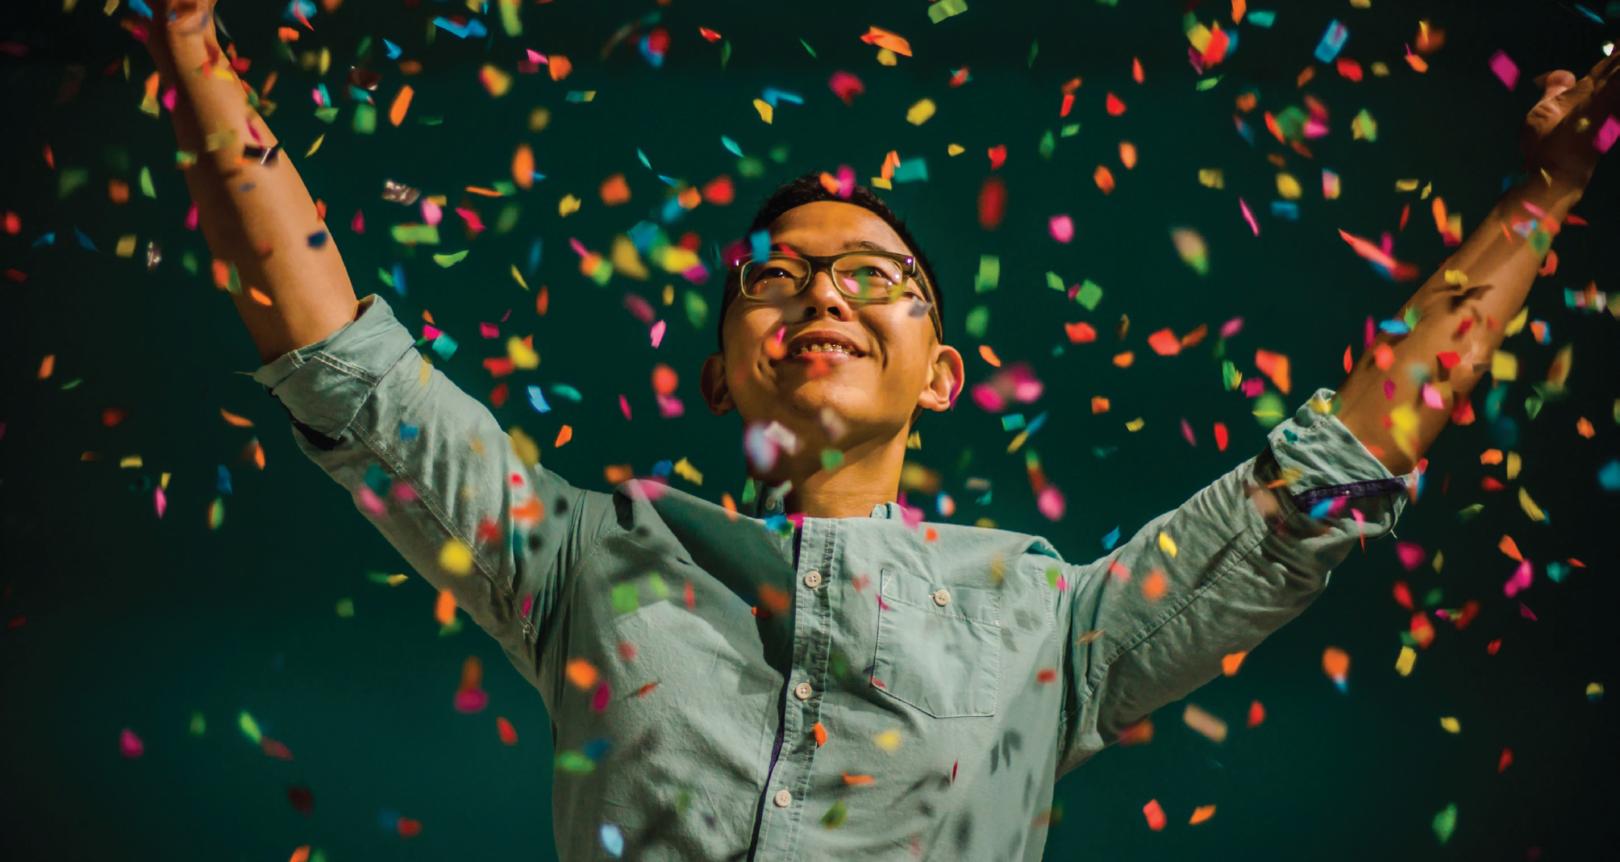 Image showcasing a man celebrating his achievements